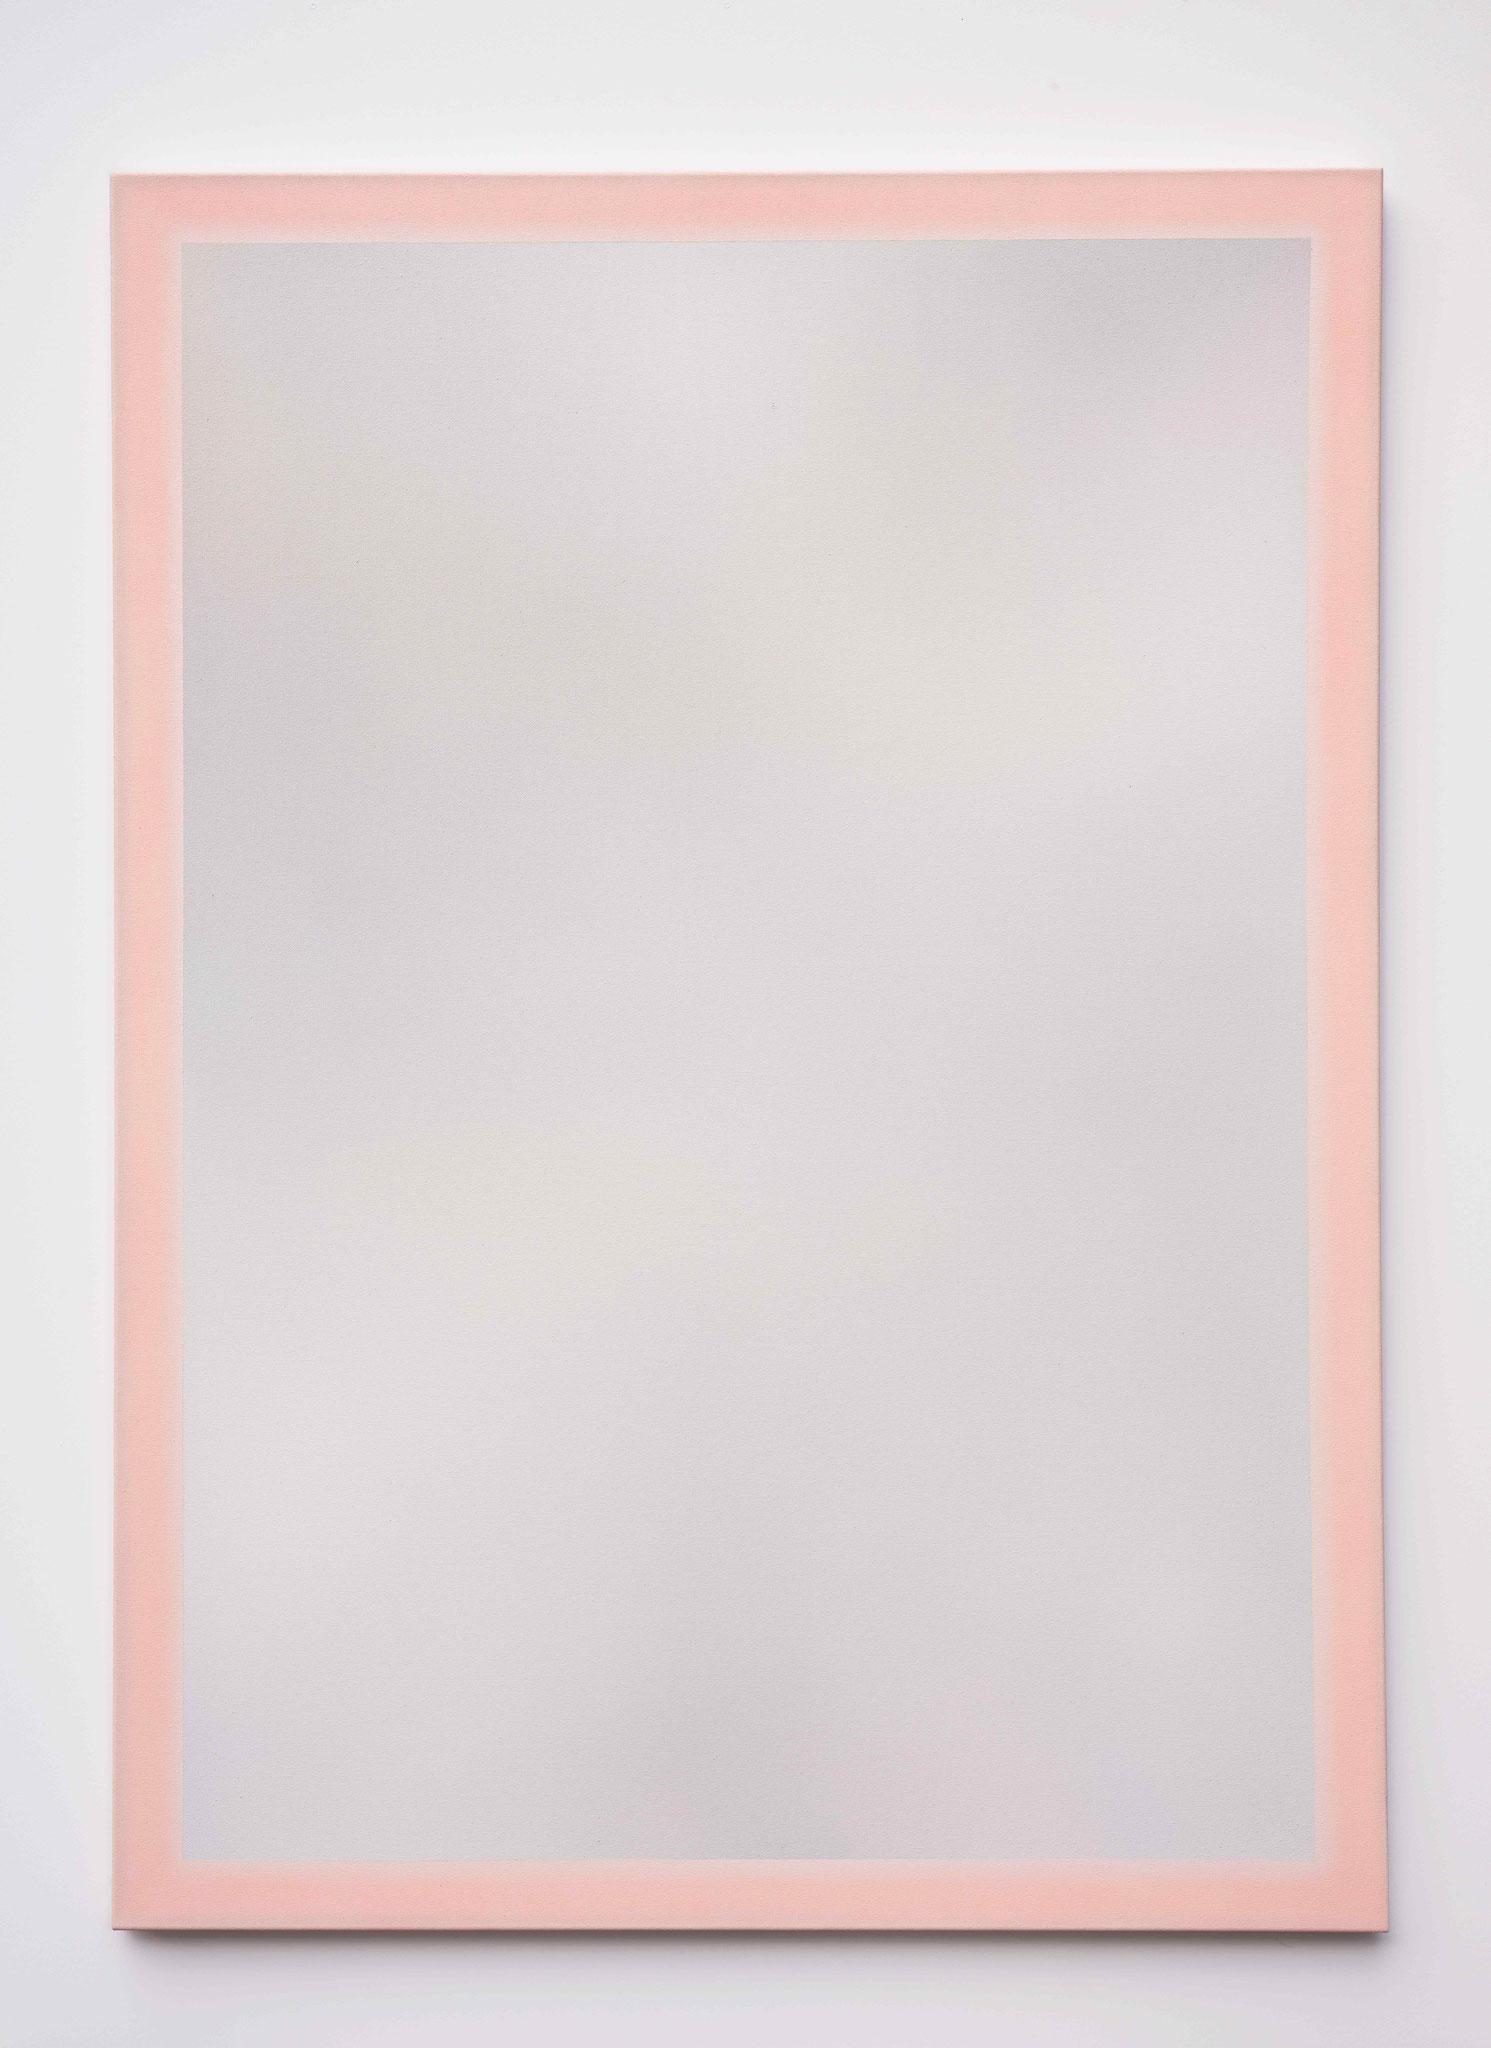 "Alina Birkner ""Untitled (Albedo)"" 2019, 180x130 cm, Acrylic on Canvas"